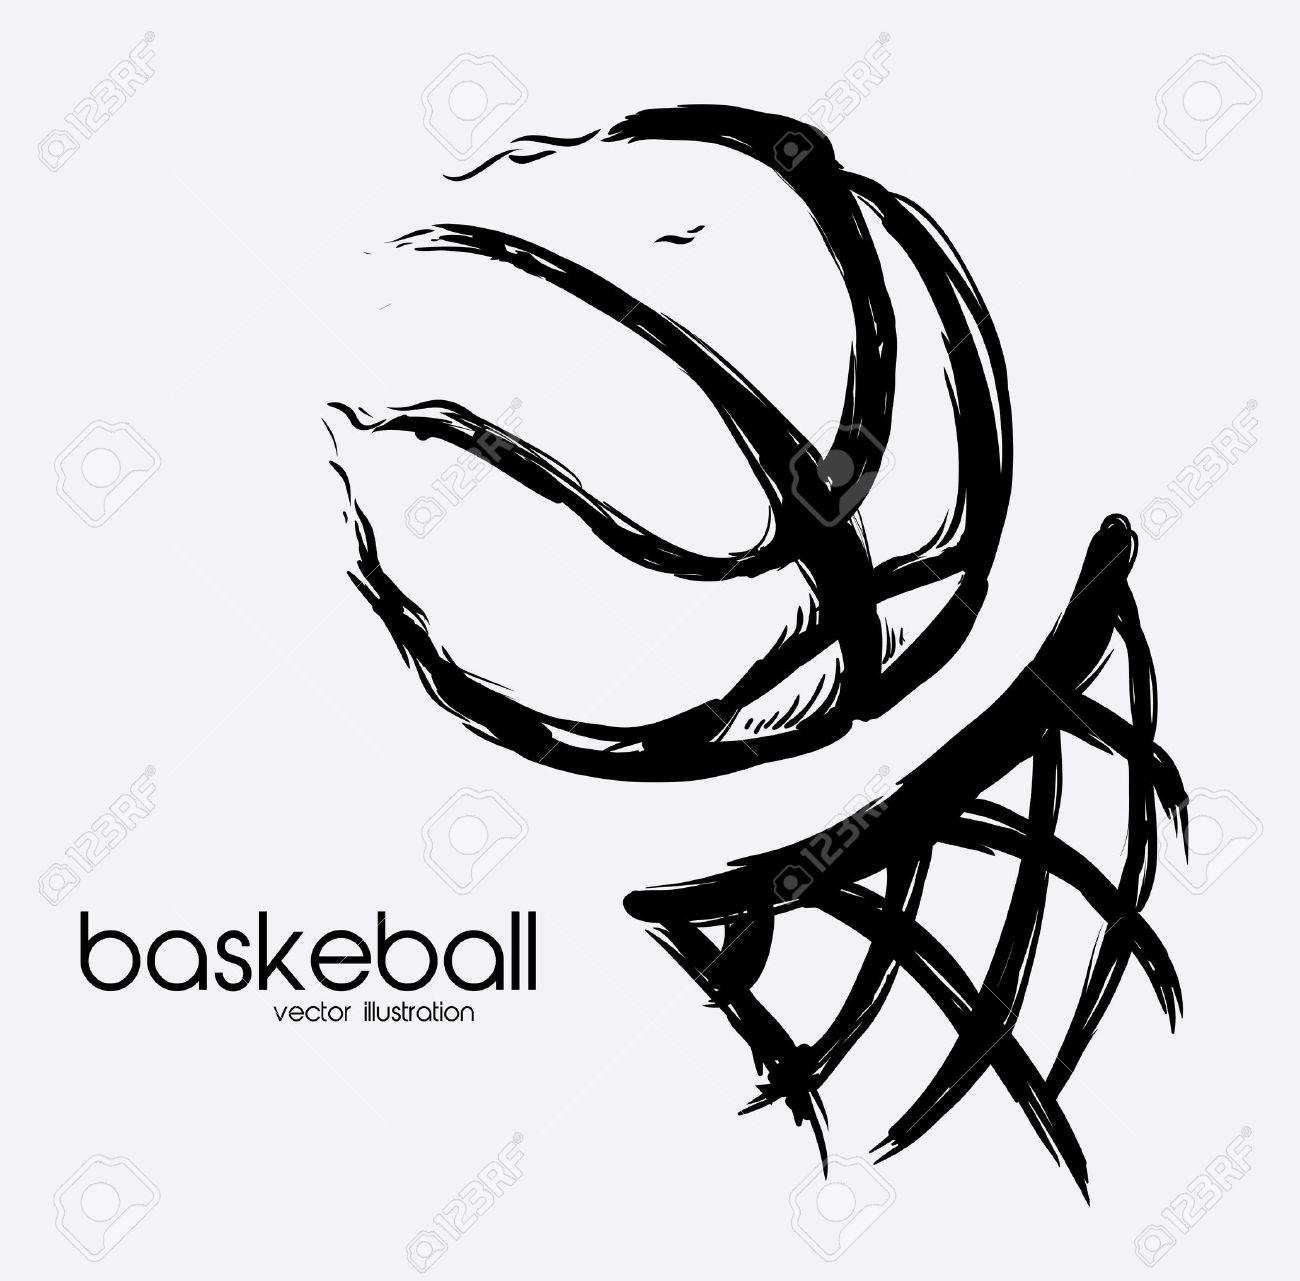 Cool Basketball Designs Basketball Poster Design